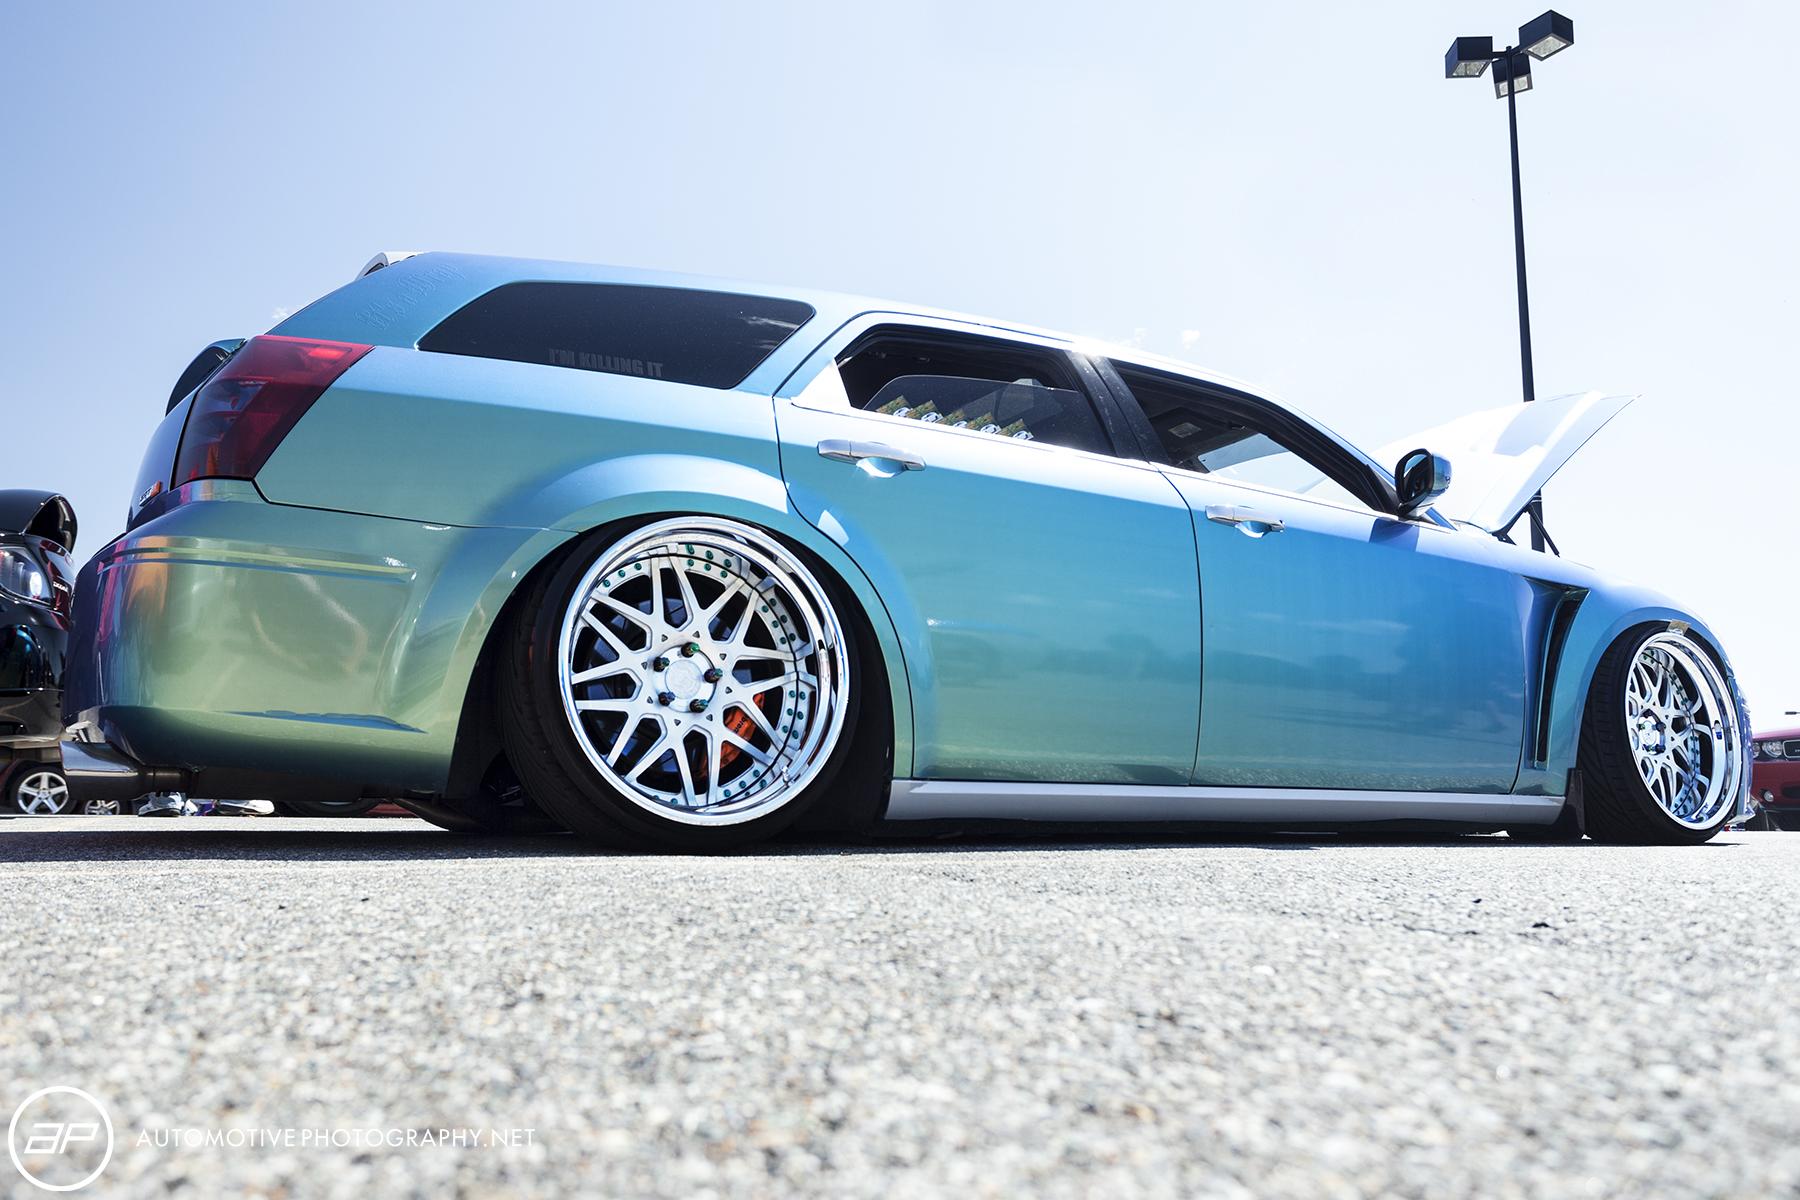 2014 Dodge Magnum Upcomingcarshq Com